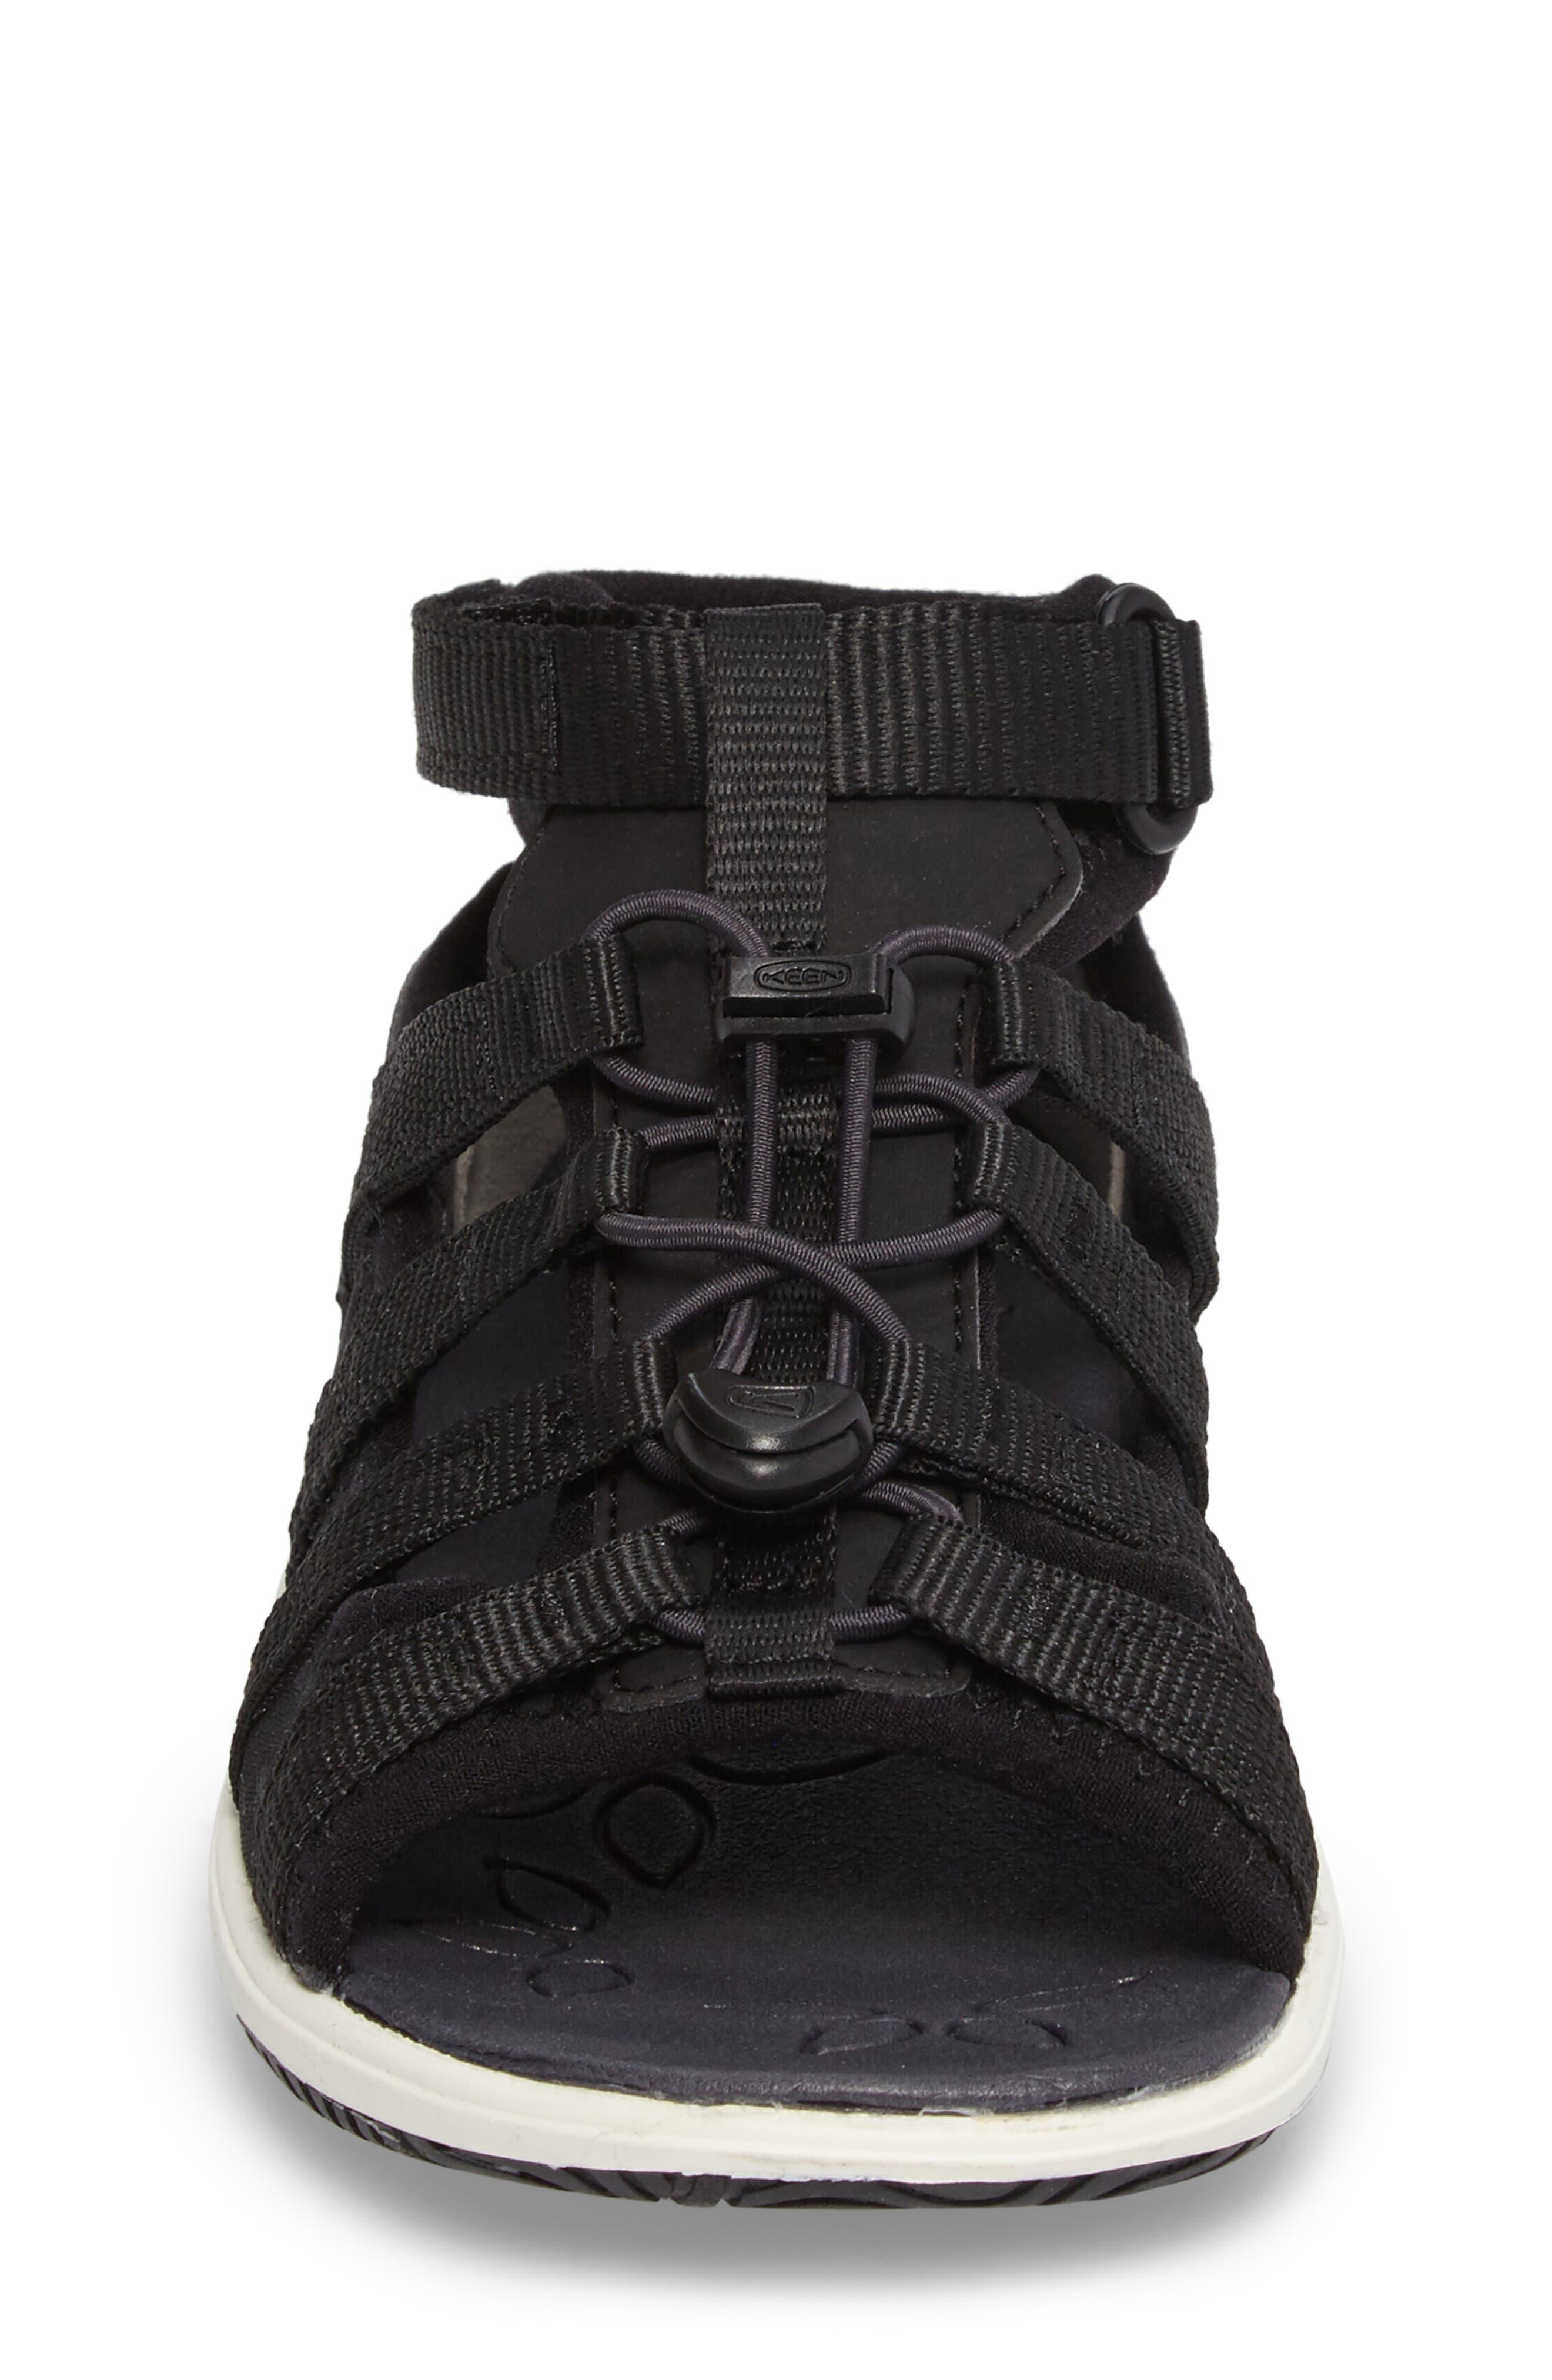 Hadley Adventure Water Friendly Sandal,                             Alternate thumbnail 4, color,                             Black/ White